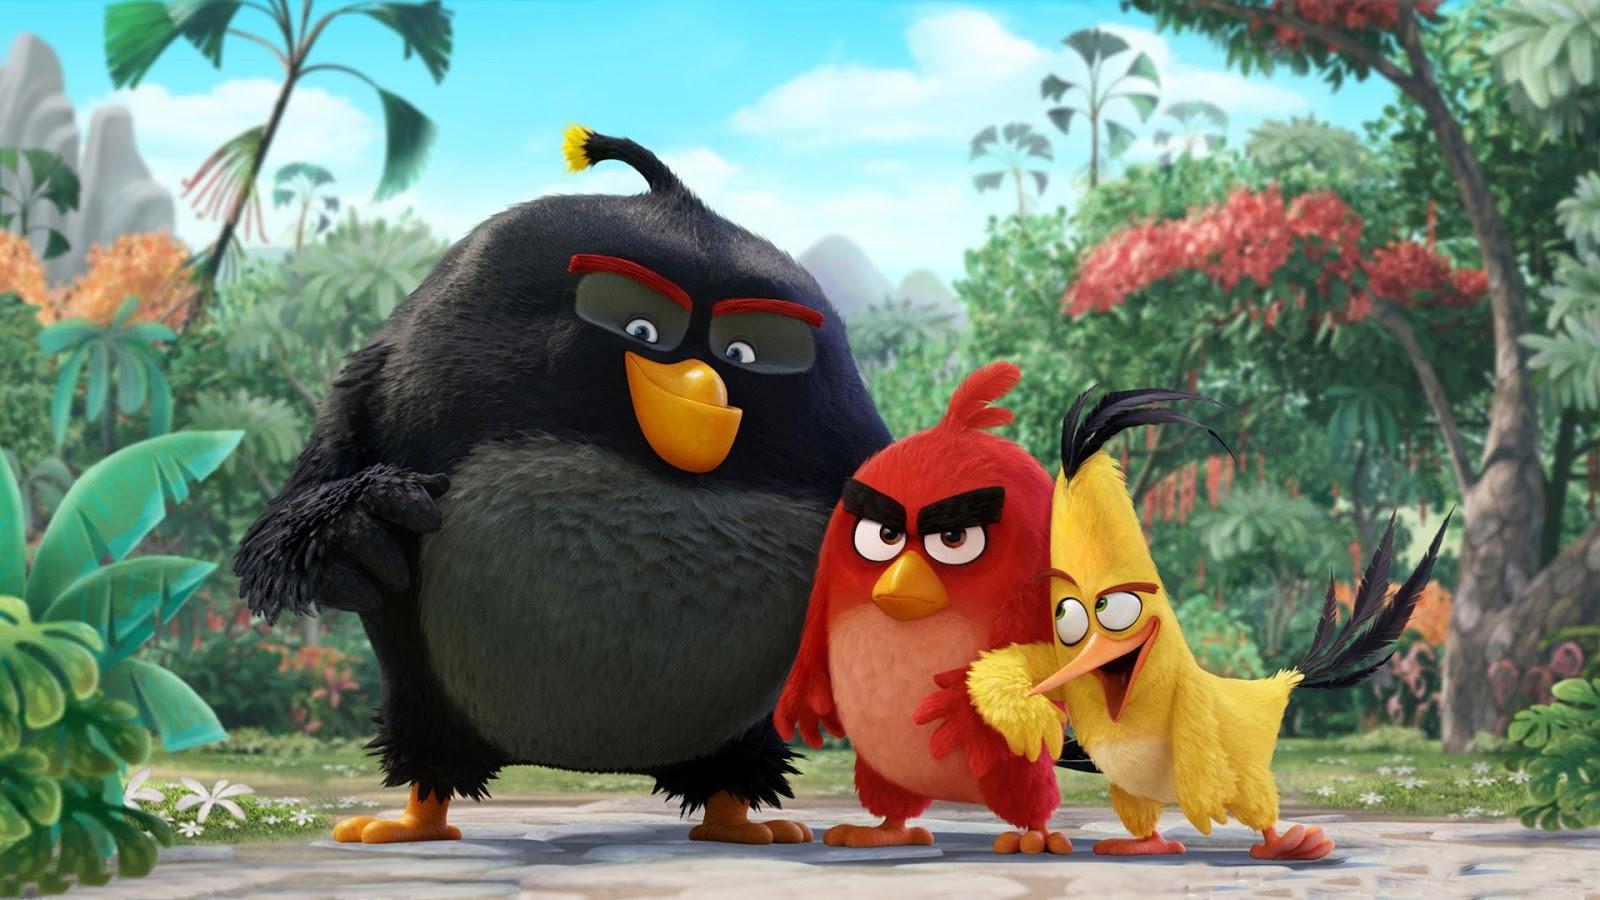 Papel de Parede do Filme Angry Birds  Fabulous Top Wallpapers